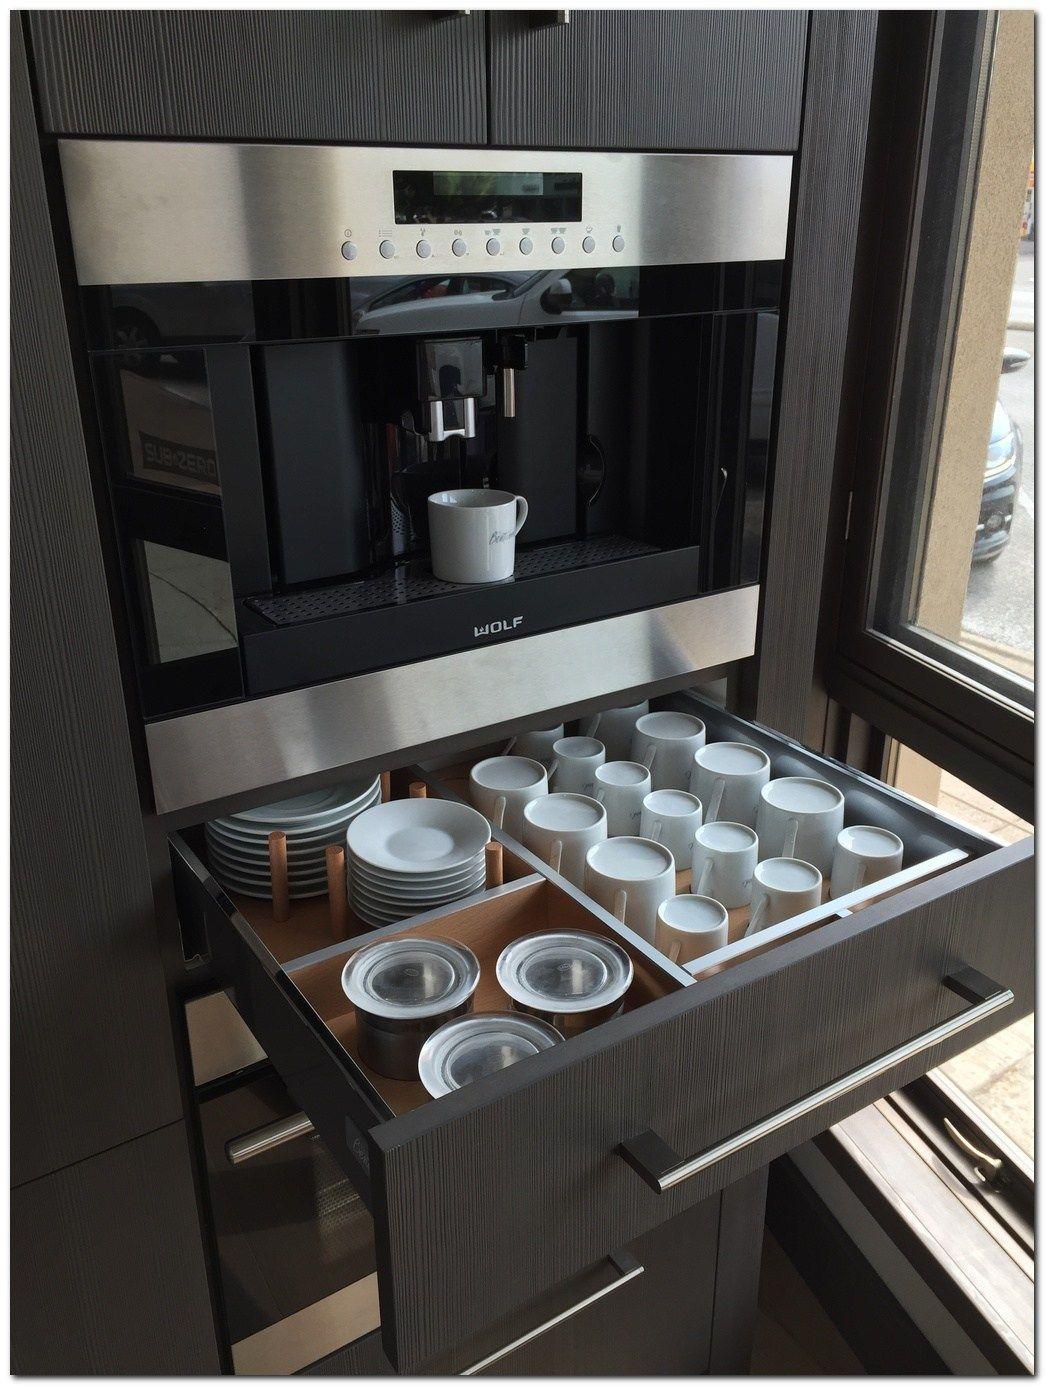 100+ Ideas to Make Coffee Maker as Unique Interior | Kaffee, Küche ...